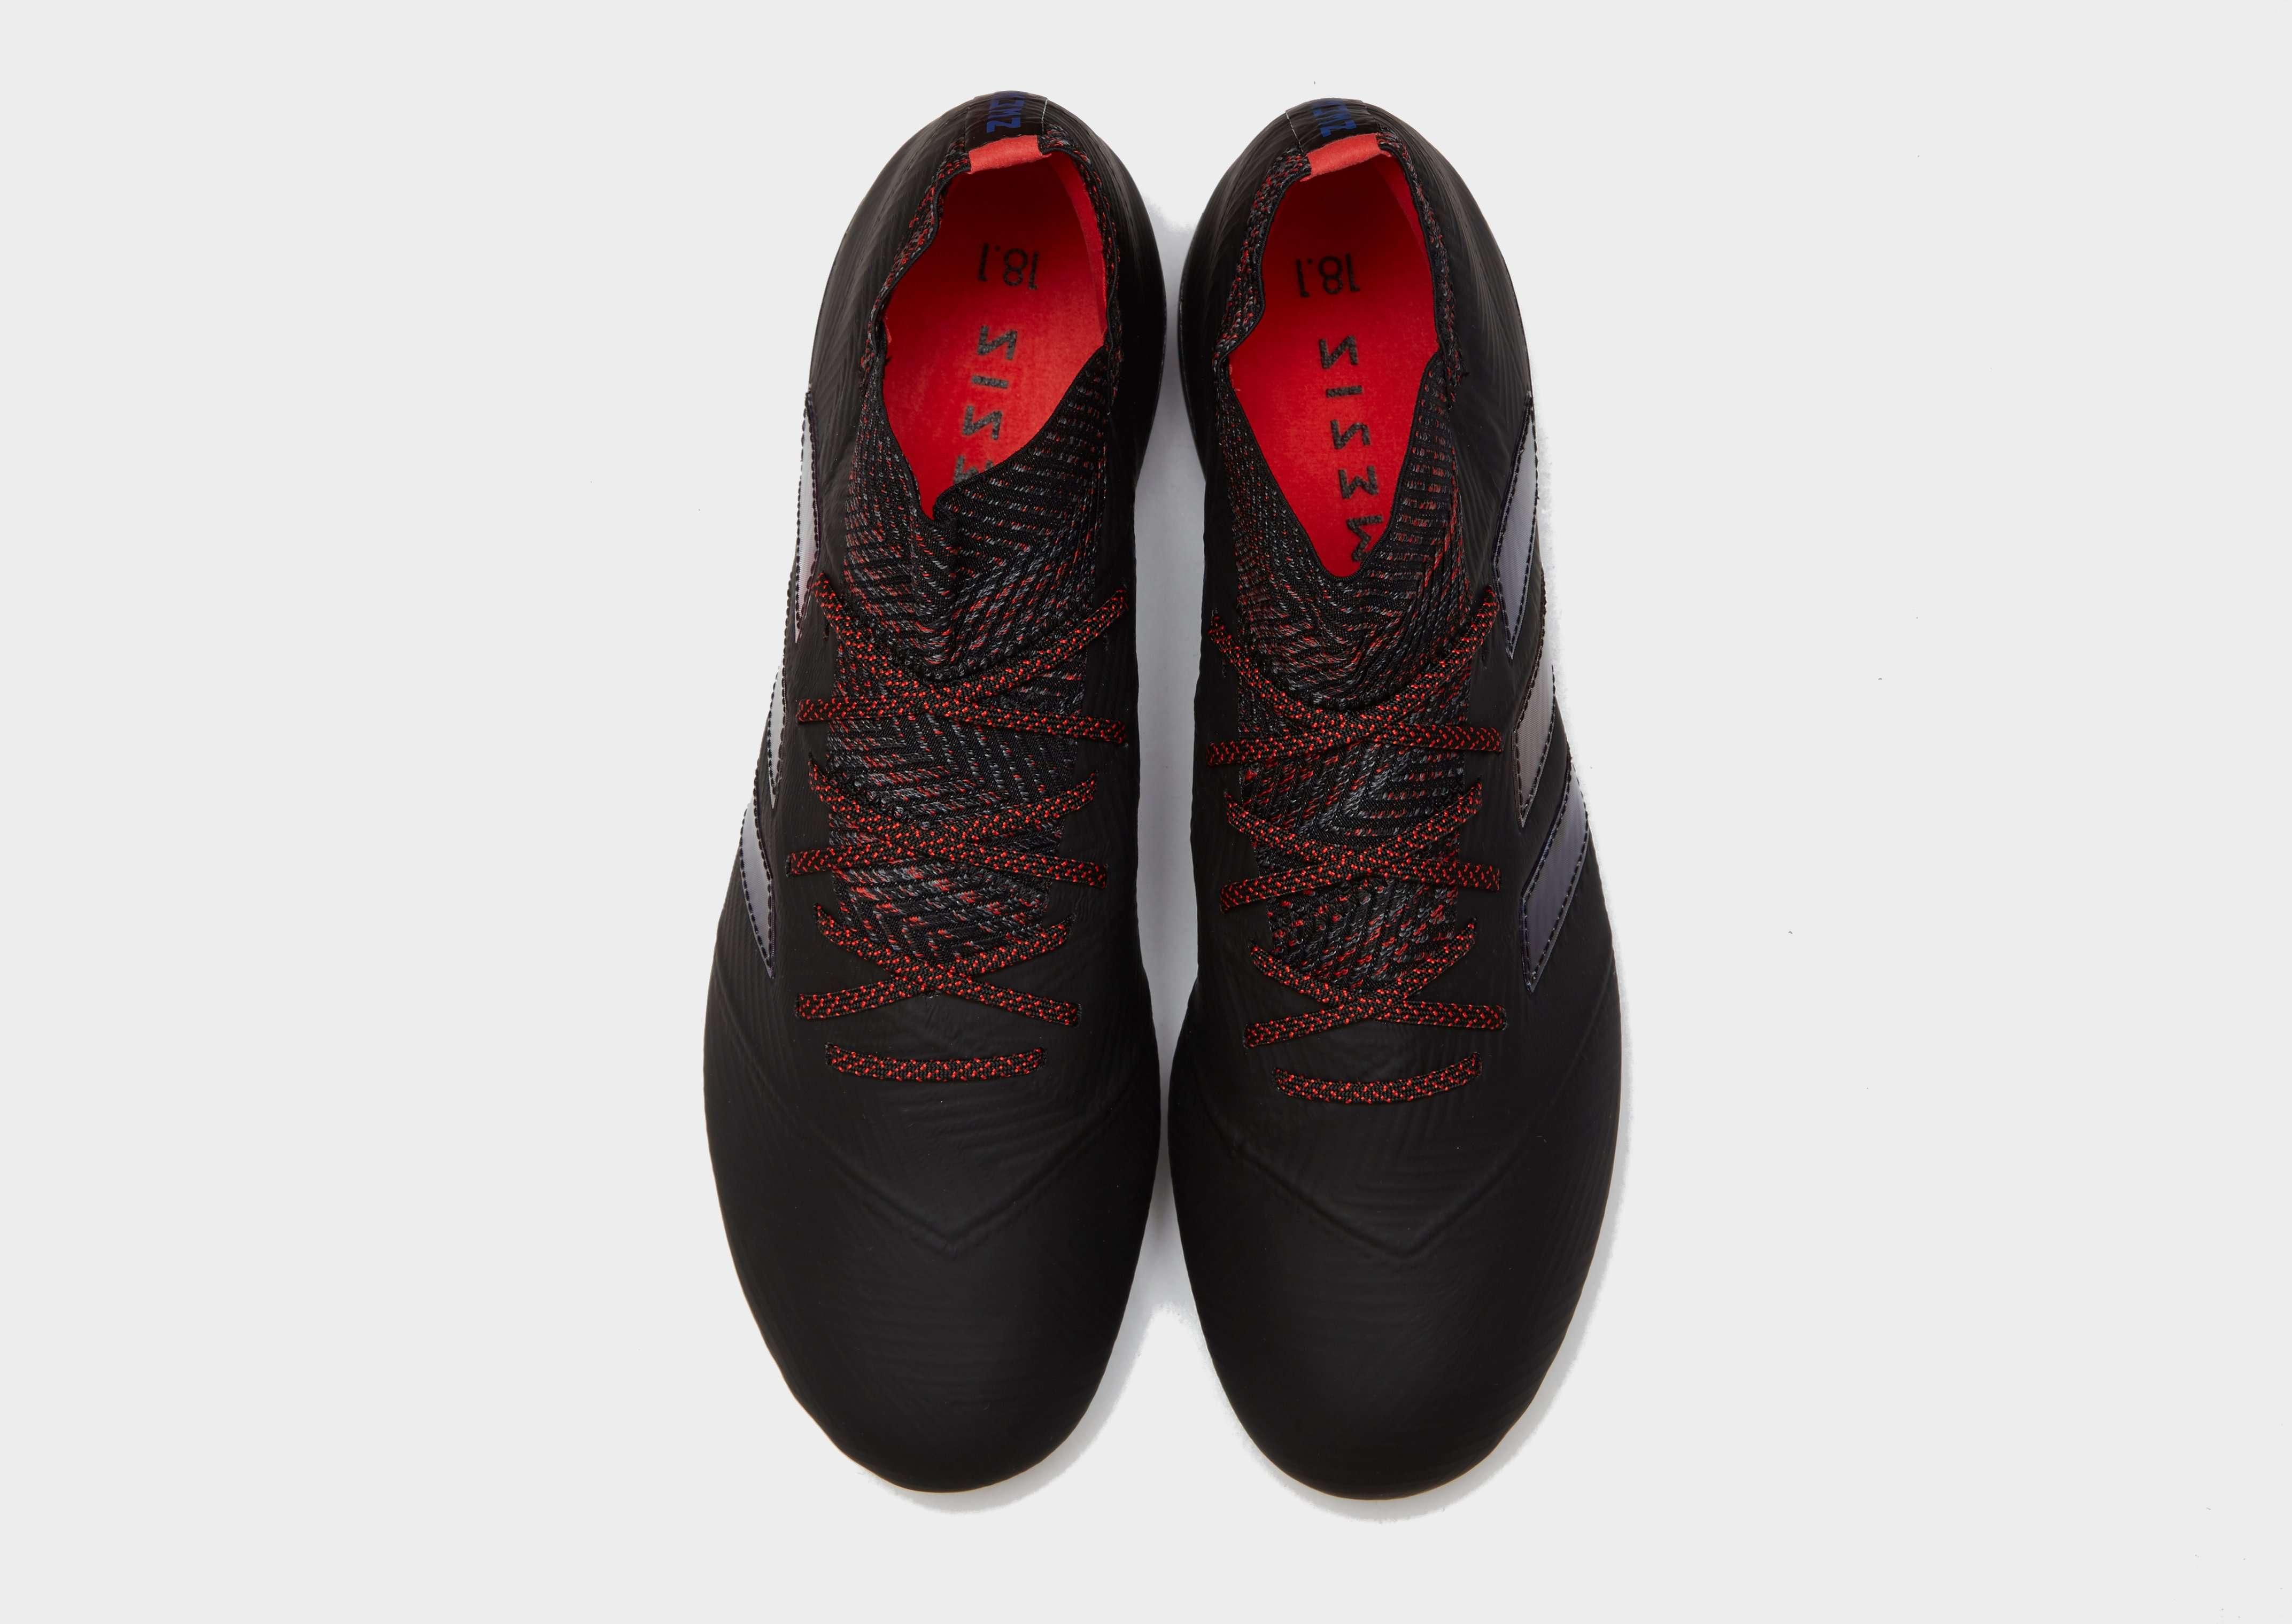 adidas Archetic Nemeziz 18.1 FG